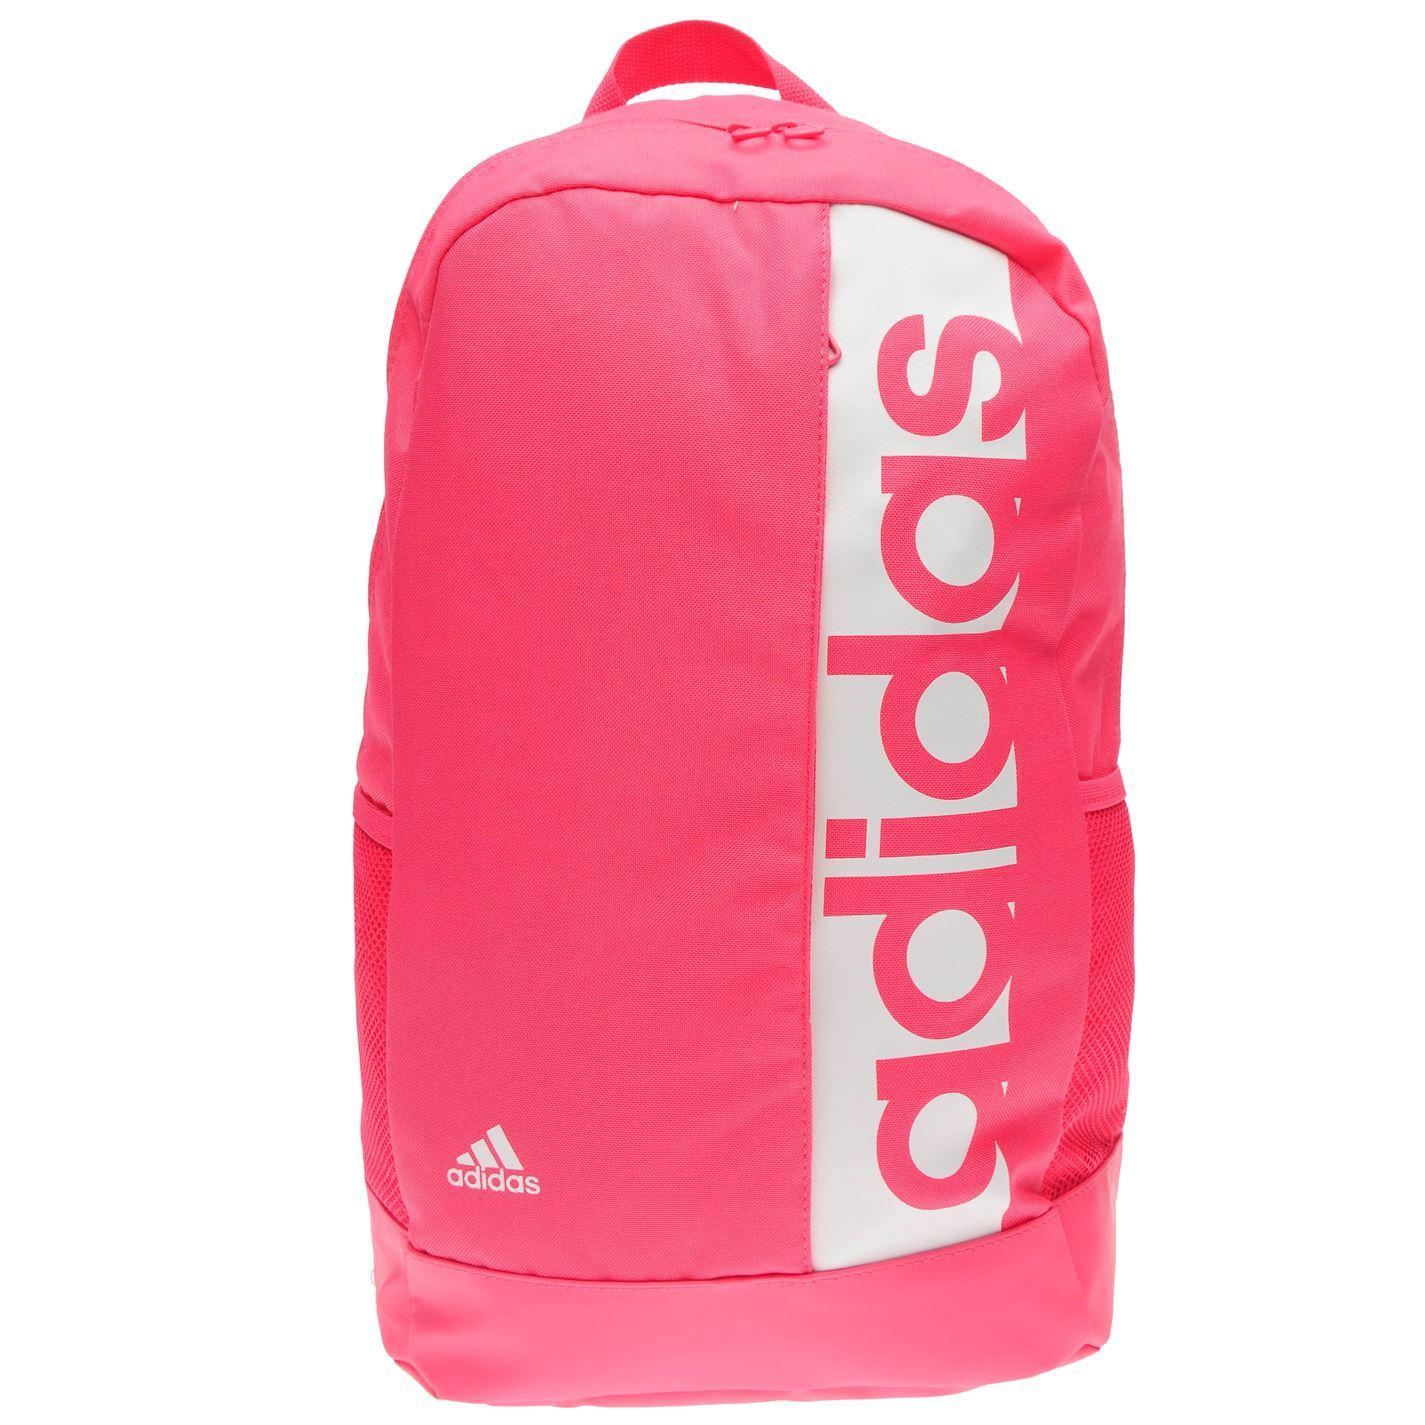 0f3262ad27 ... adidas Linear Backpack Pink White Rucksack Daypack Bag ...